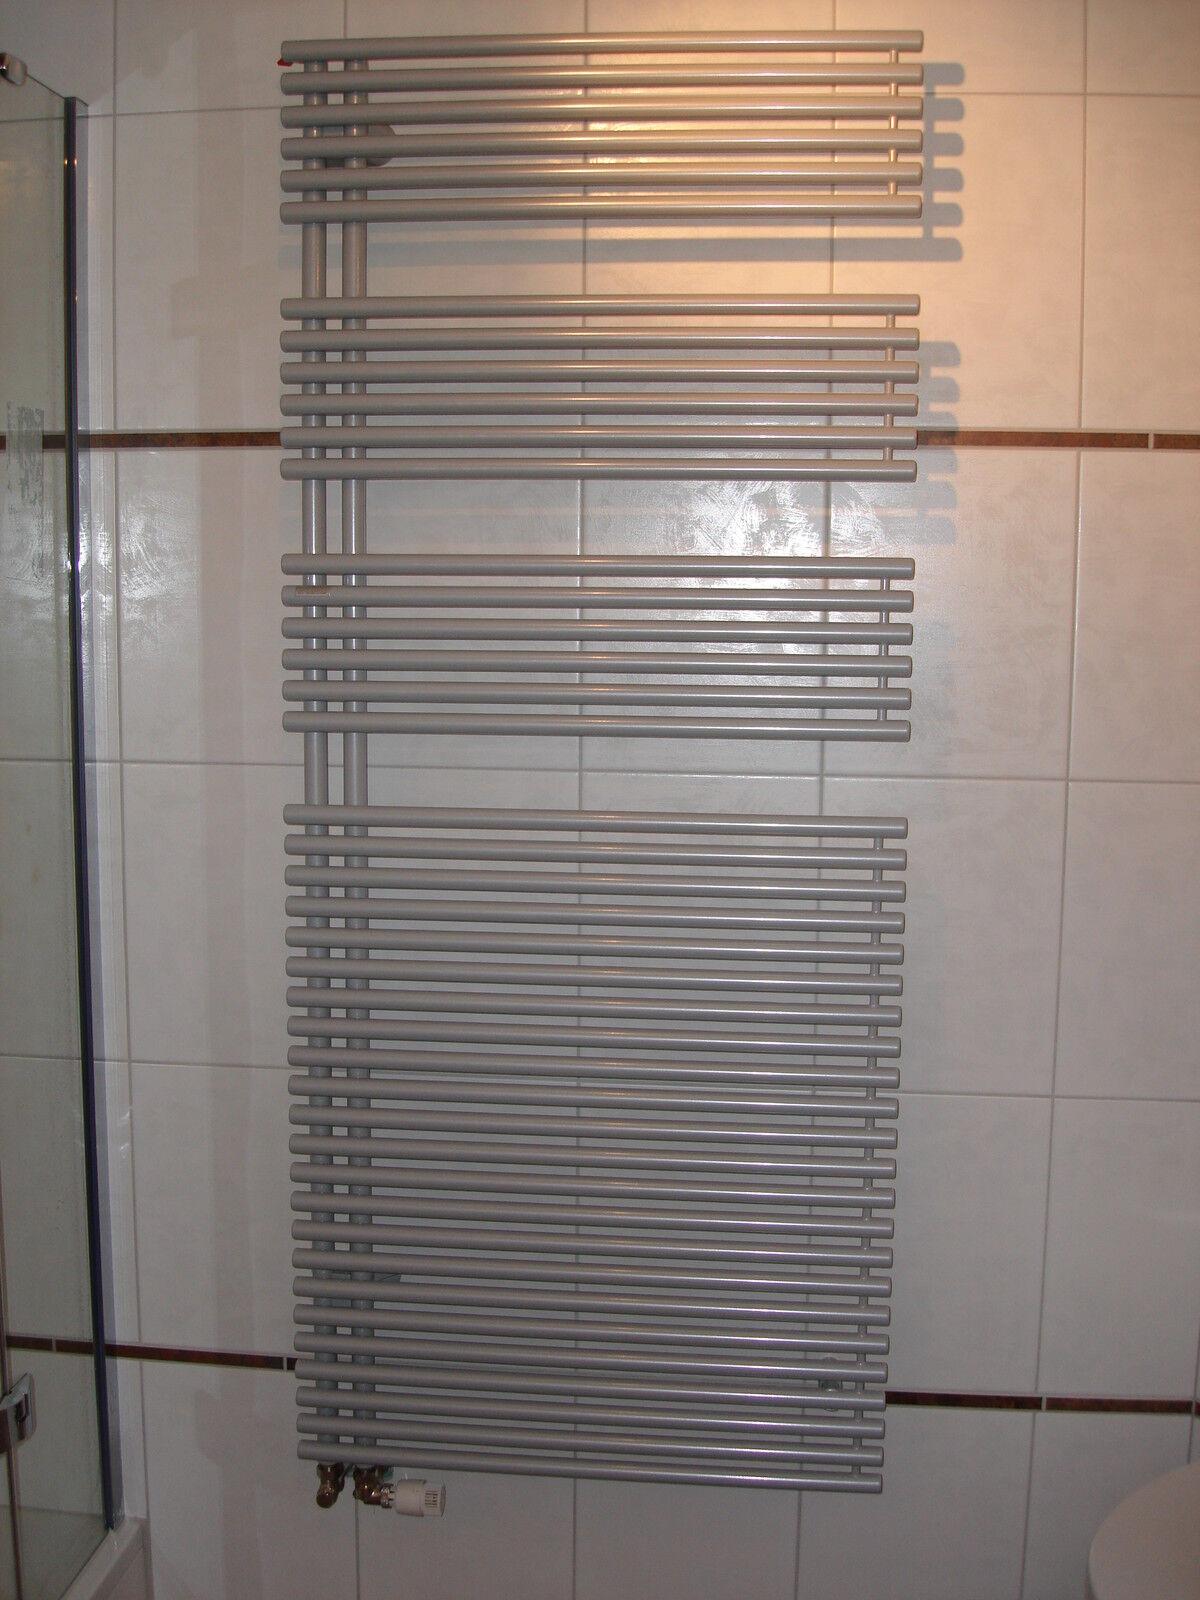 Arbonia Arbonia Arbonia Bagnotherm Move BTM Handtuchheizkörper, Bad- und Designheizkörper 2091fc